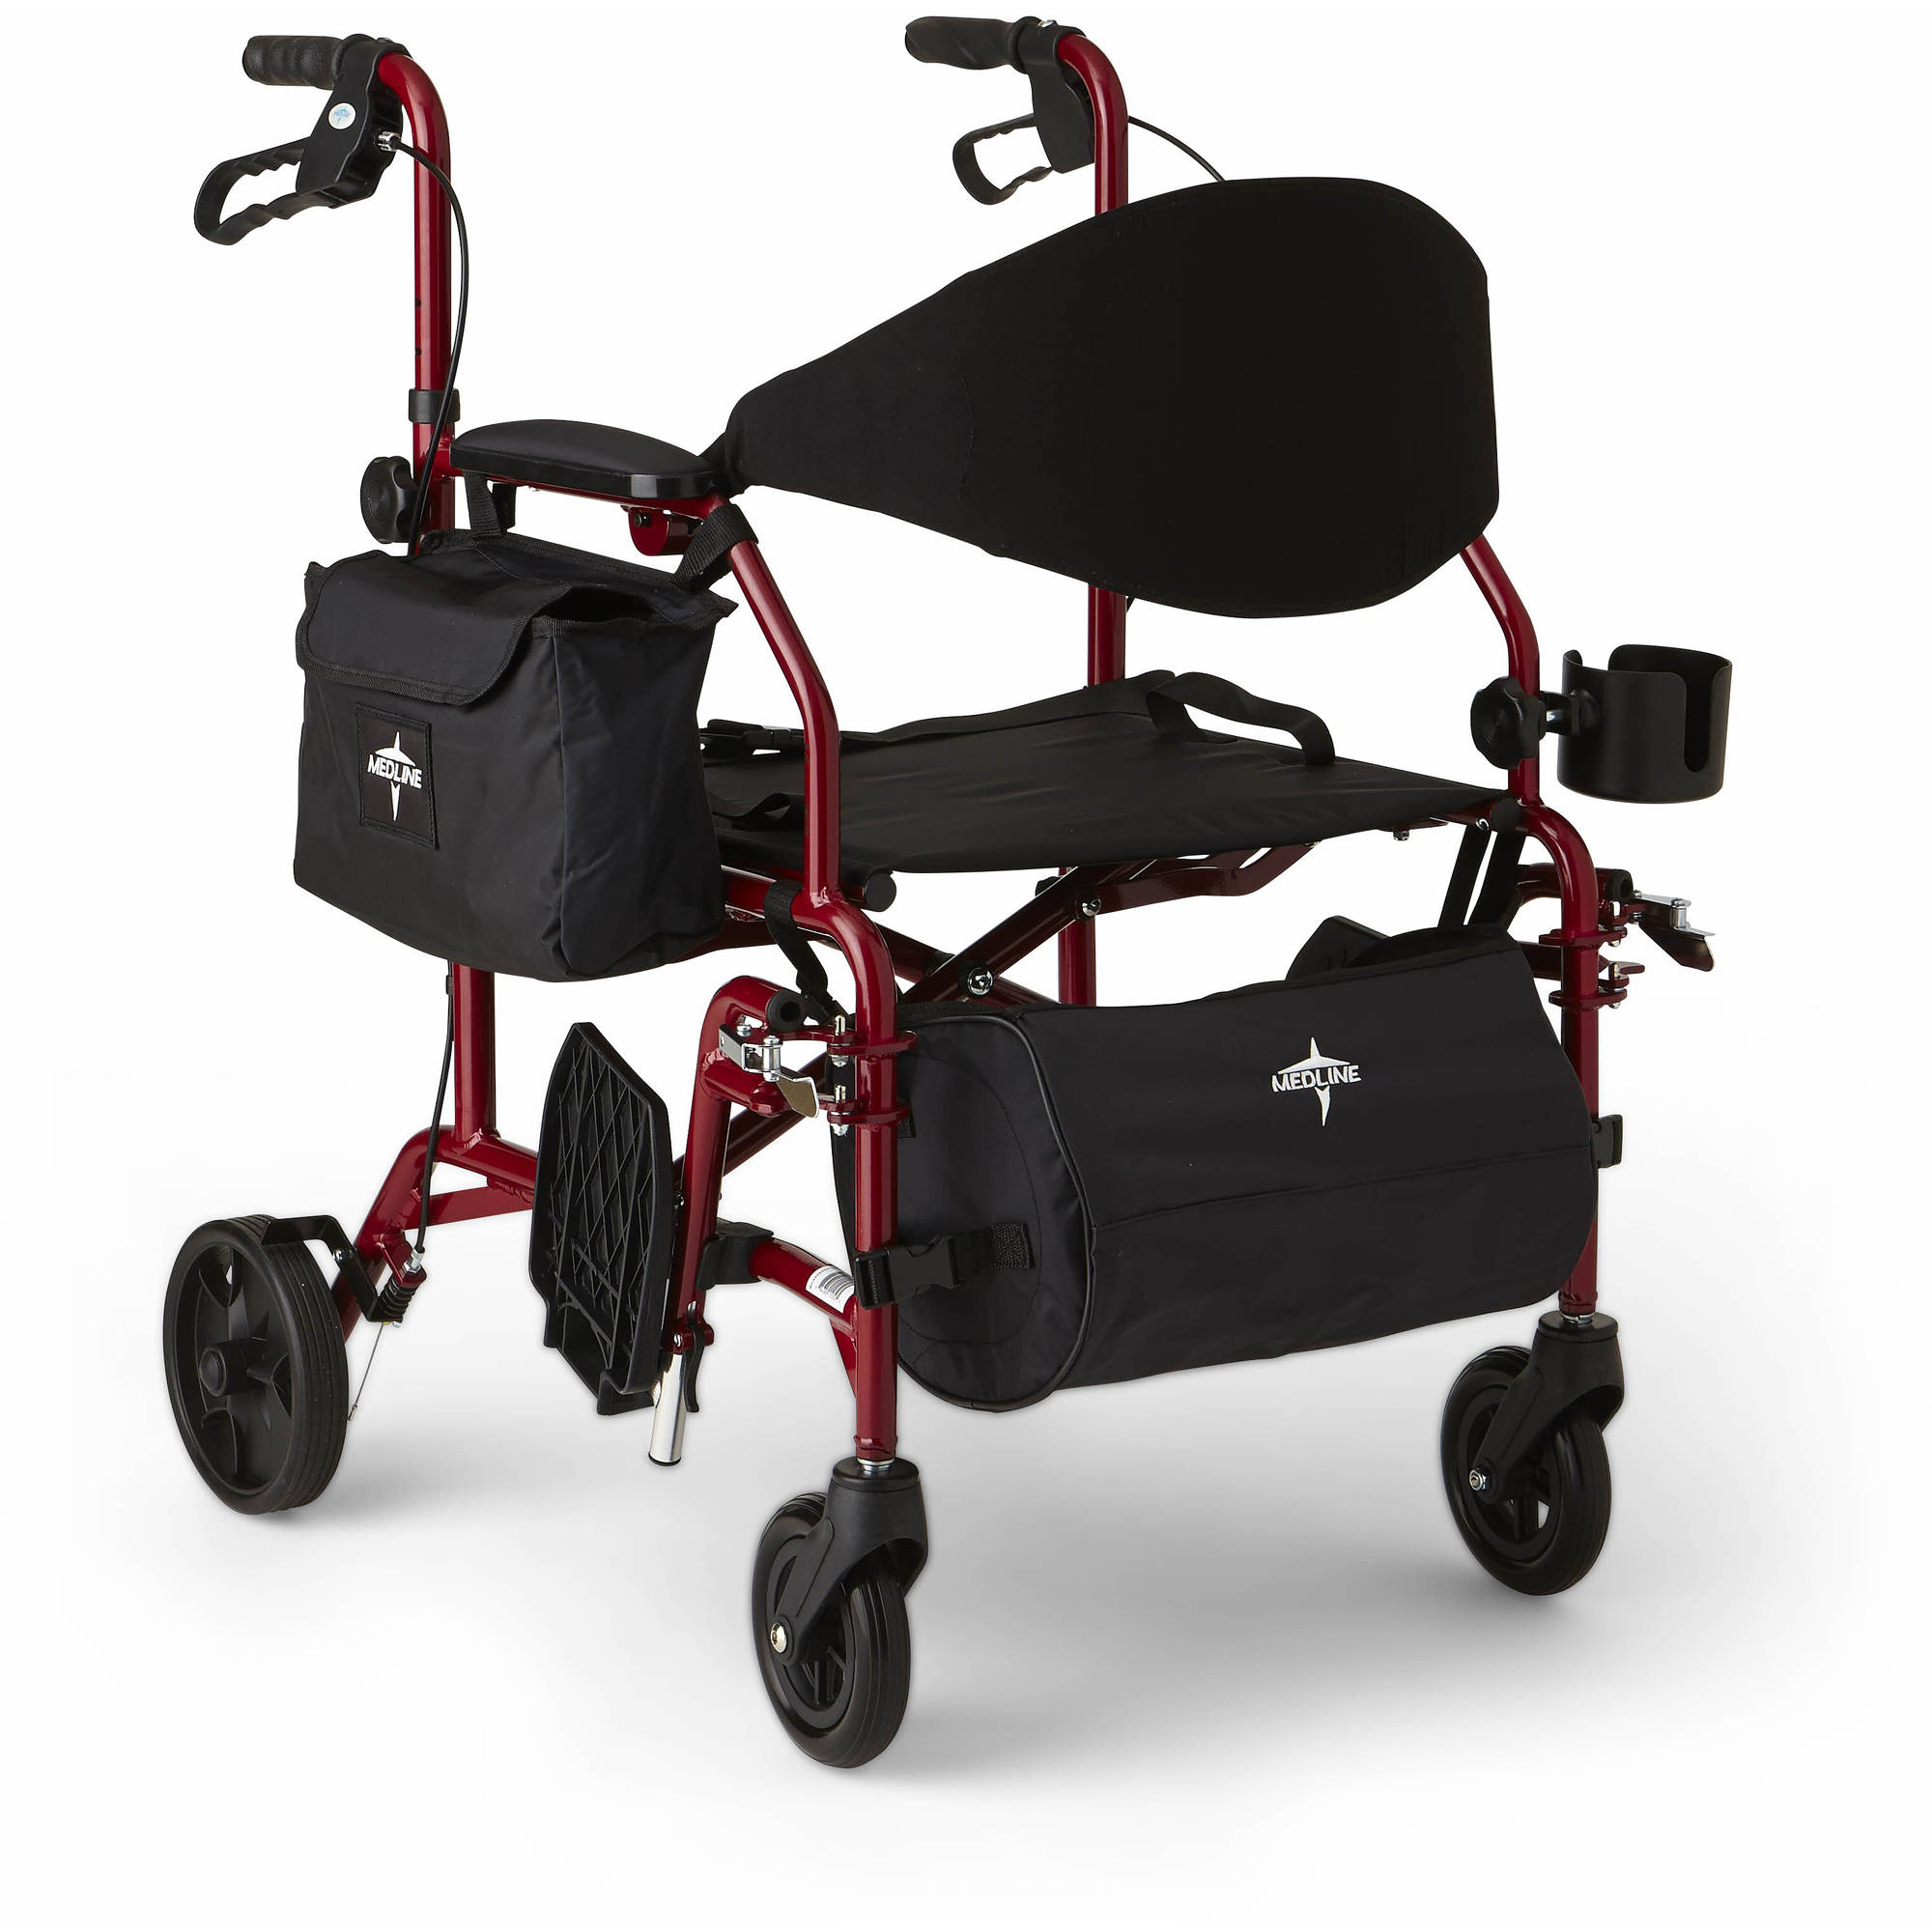 Medline Combination Rollator/Transport Wheelchair, Red